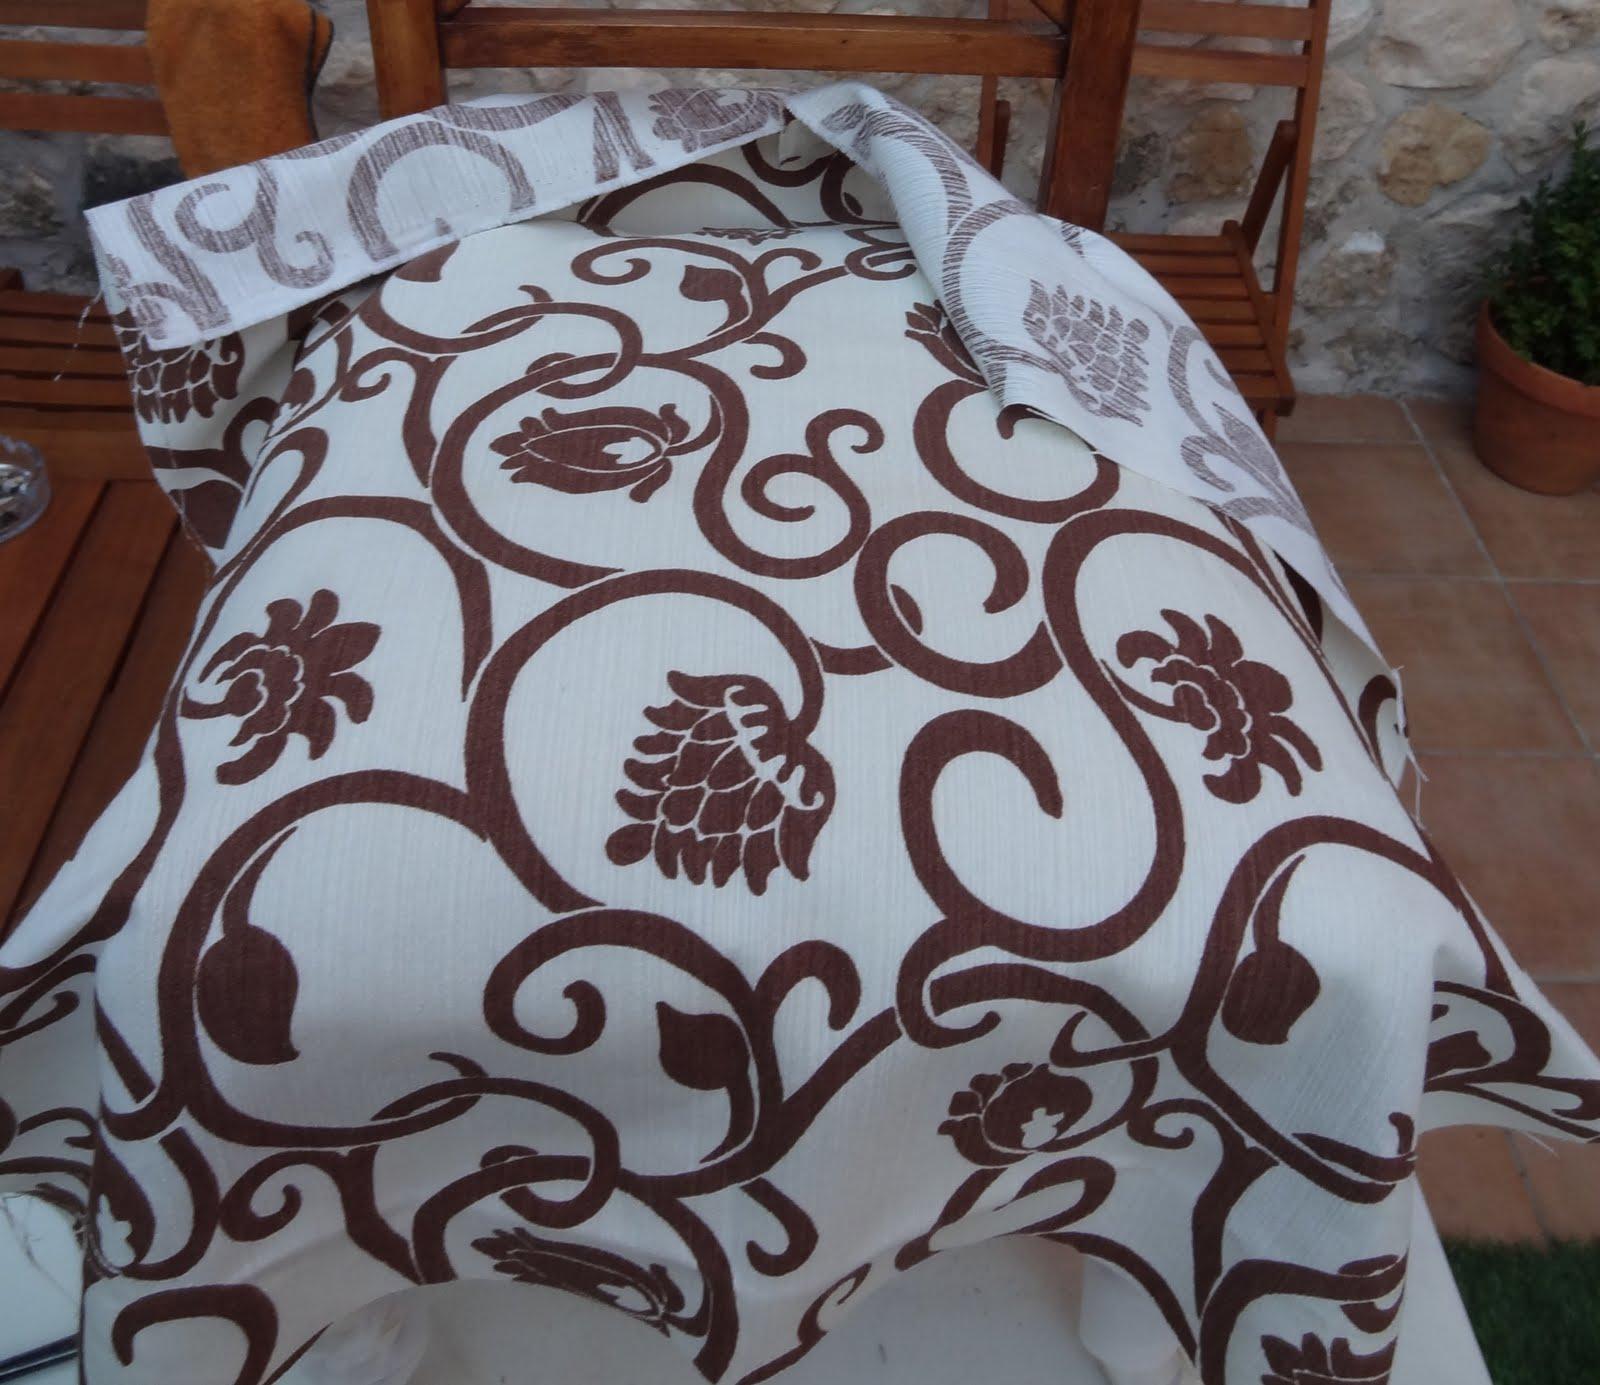 Tallerblog de restauraci n de muebles antiguos curso de for Sillas tapizadas estampadas